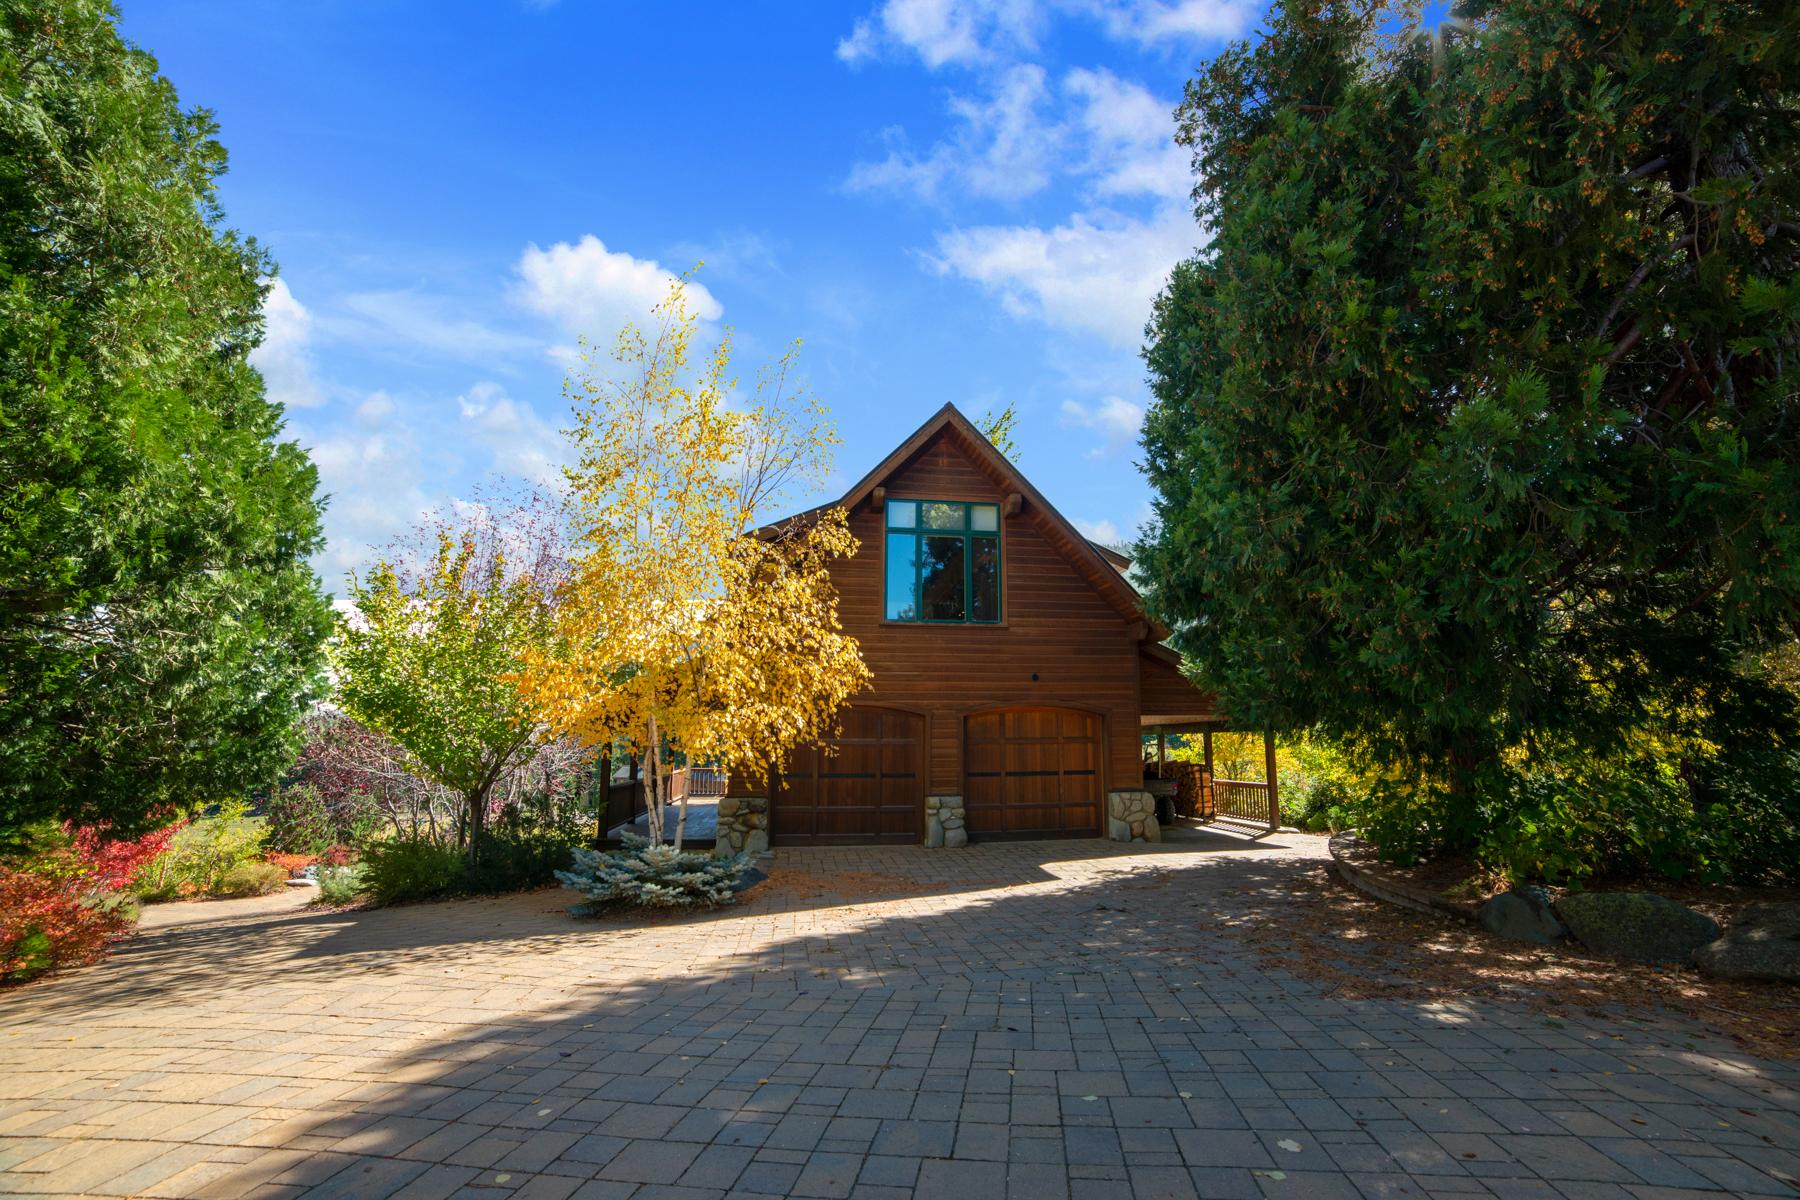 Additional photo for property listing at 1245 Carmichael Road Clio California 96106 1245 Carmichael Road Clio, California 96106 Estados Unidos